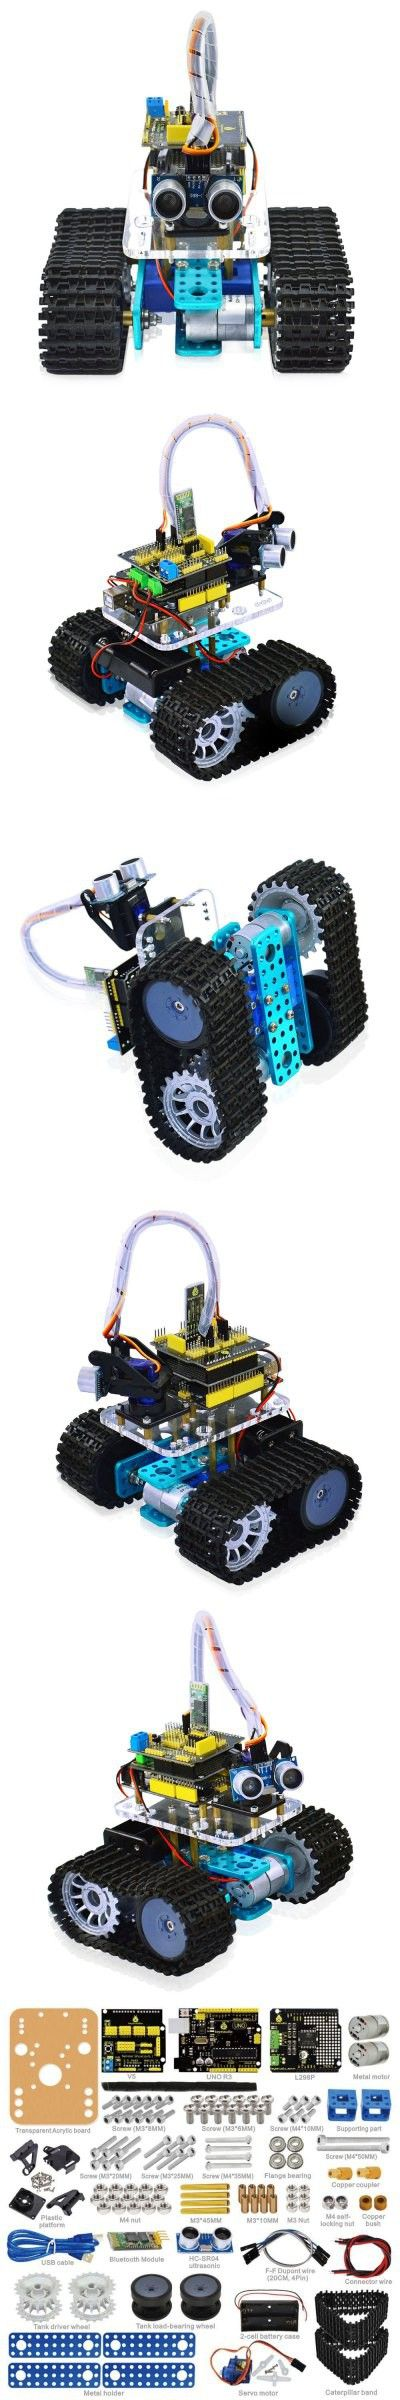 Arduino & SCM Supplies   Keyestudio TS - 50 Mini Bluetooth Tank Robot Smart Car Kit $66.16